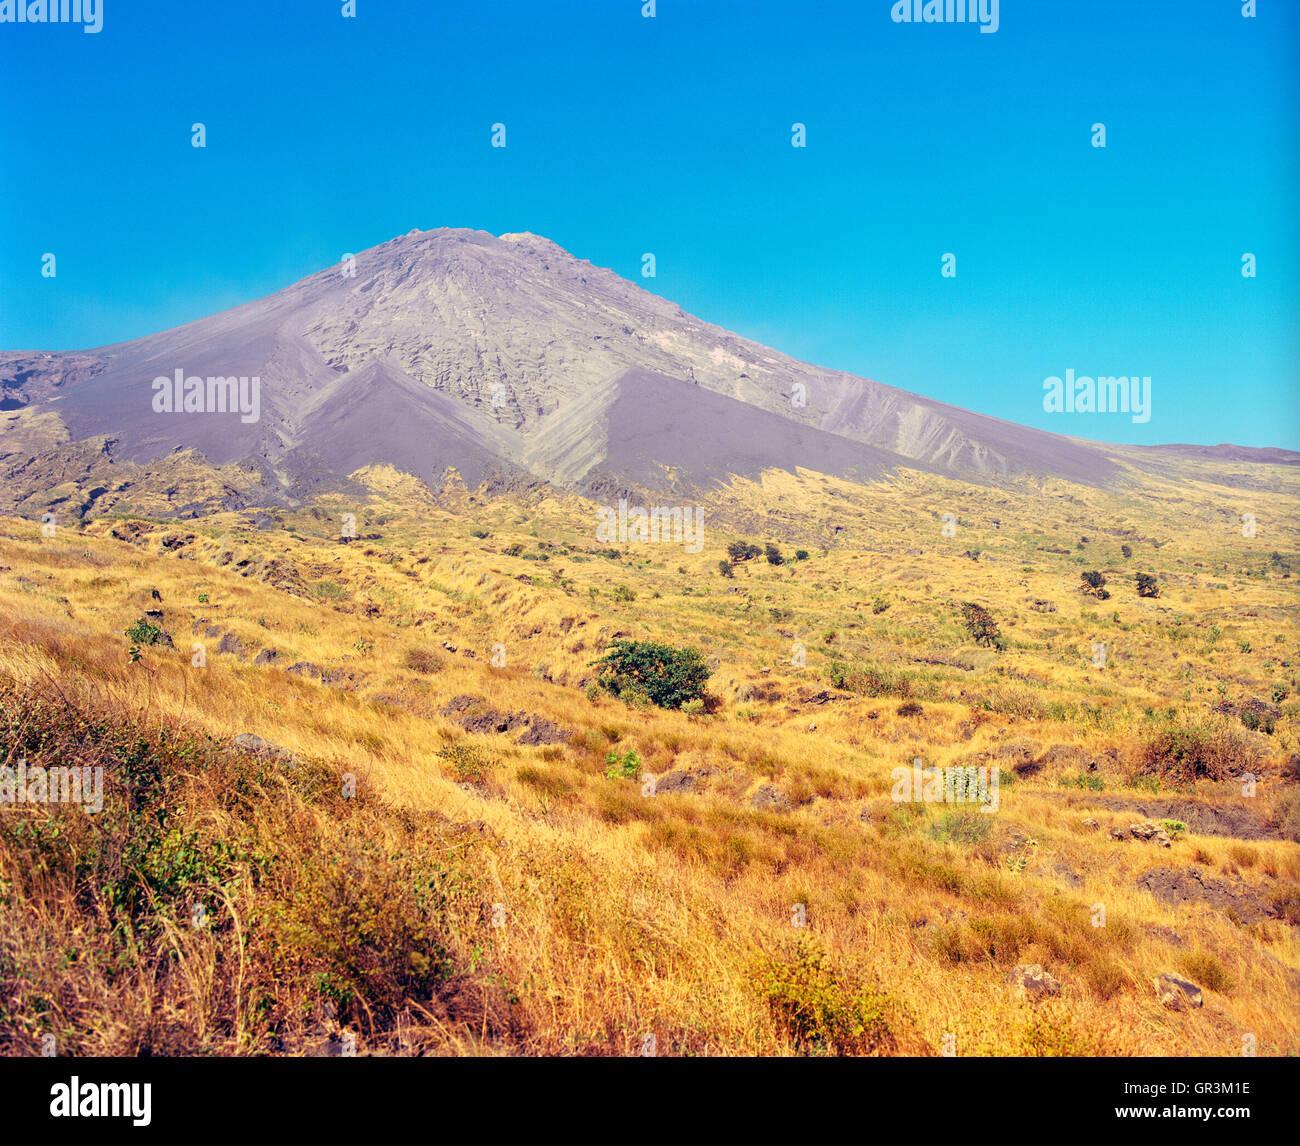 Pico de Fogo. Fogo, Cap-Vert, l'Afrique. Photo Stock